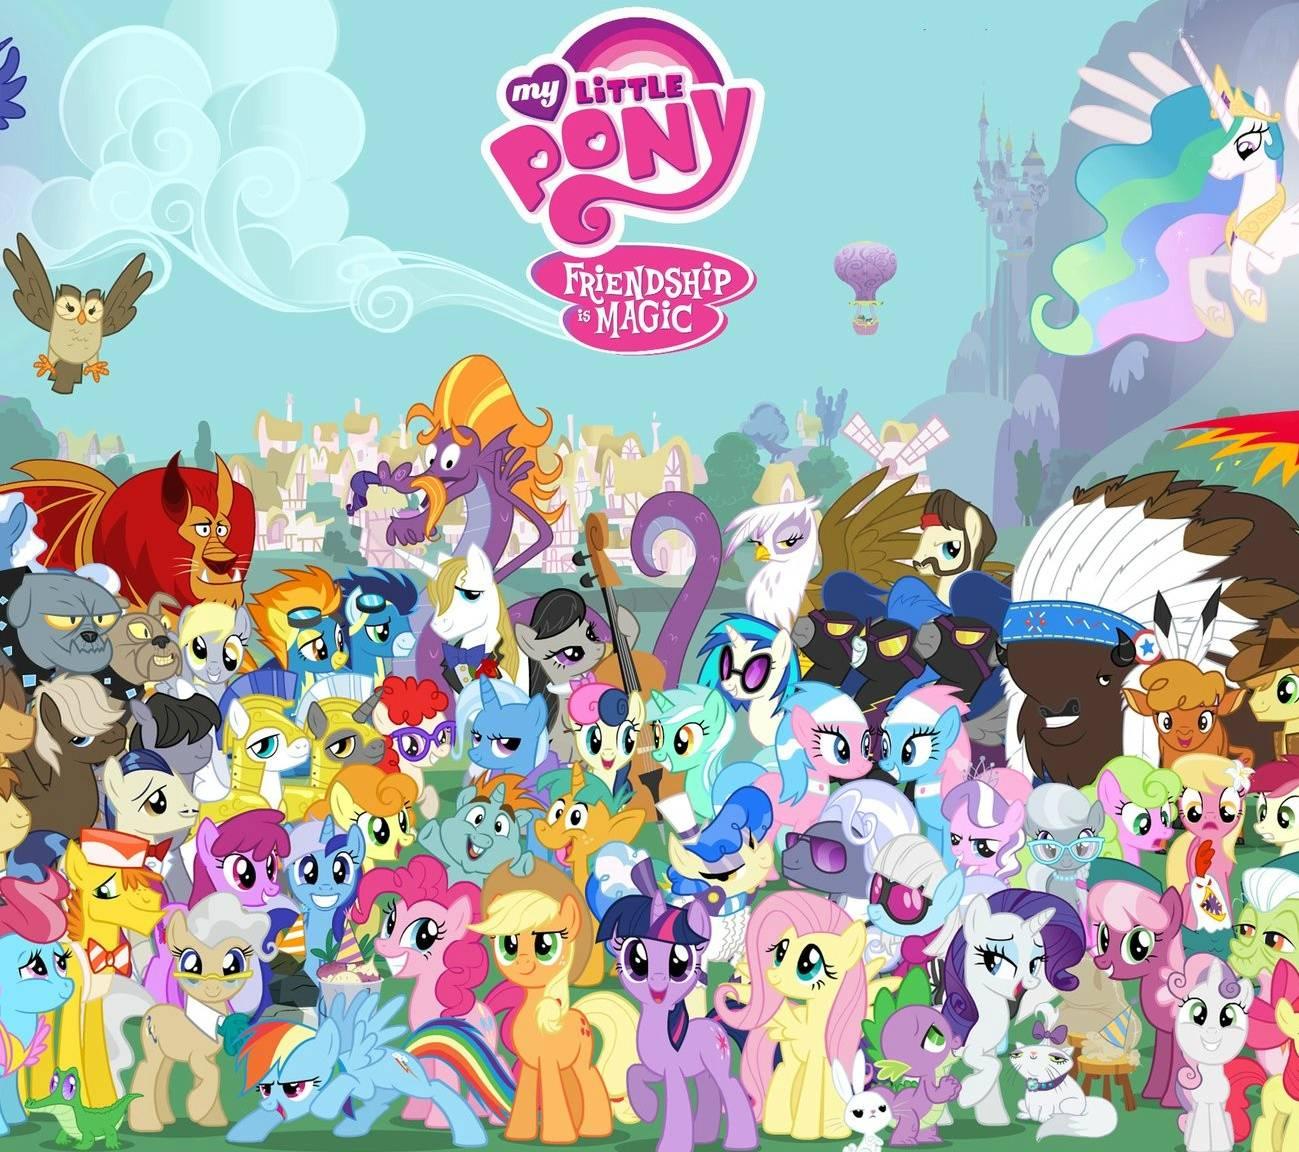 My Little Pony G4